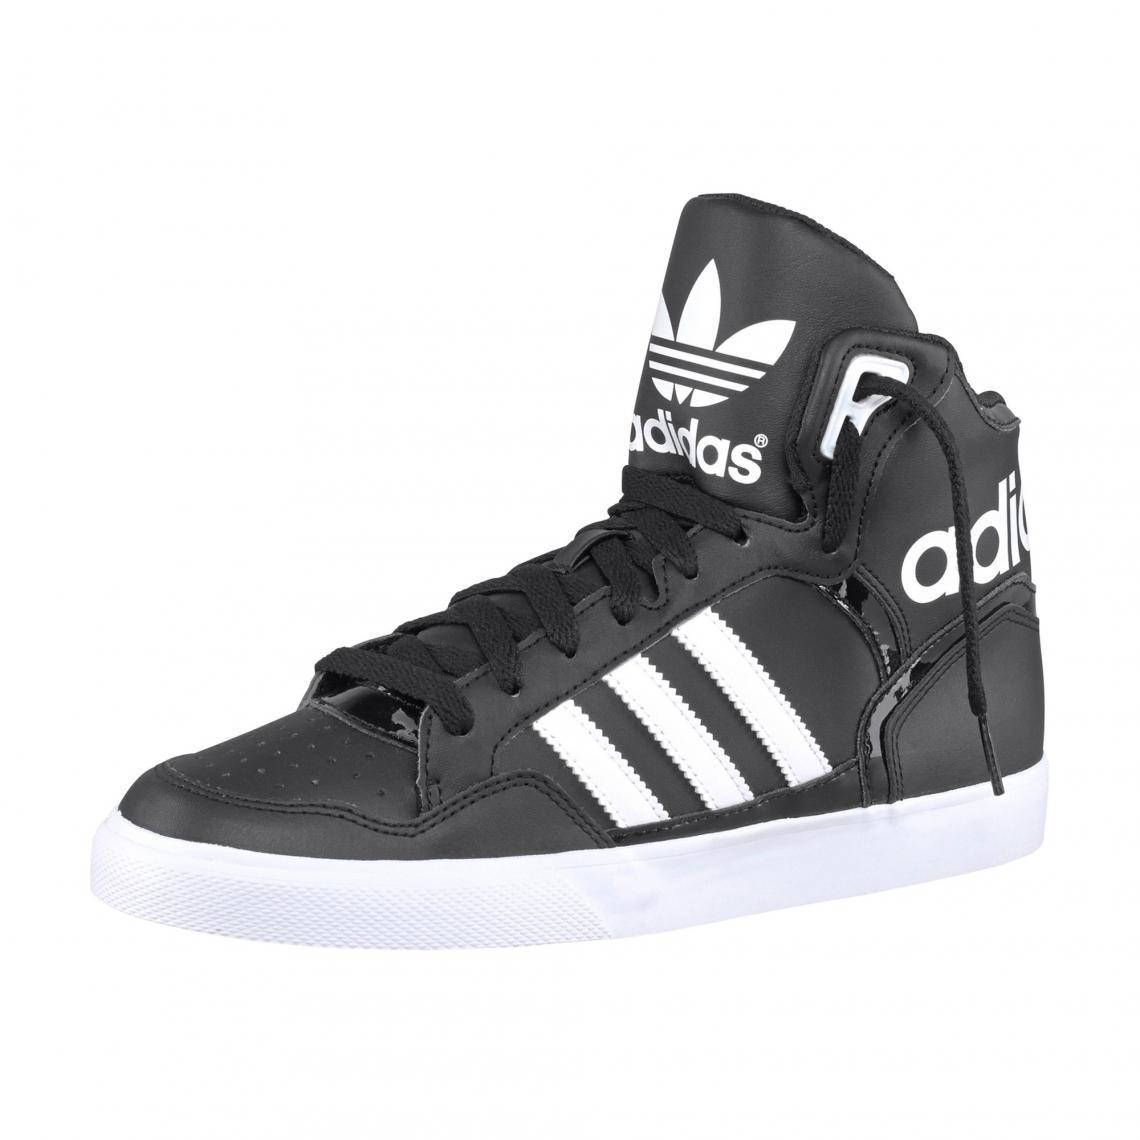 Baskets Femme Extaball W Adidas Originals Noir | 3 SUISSES